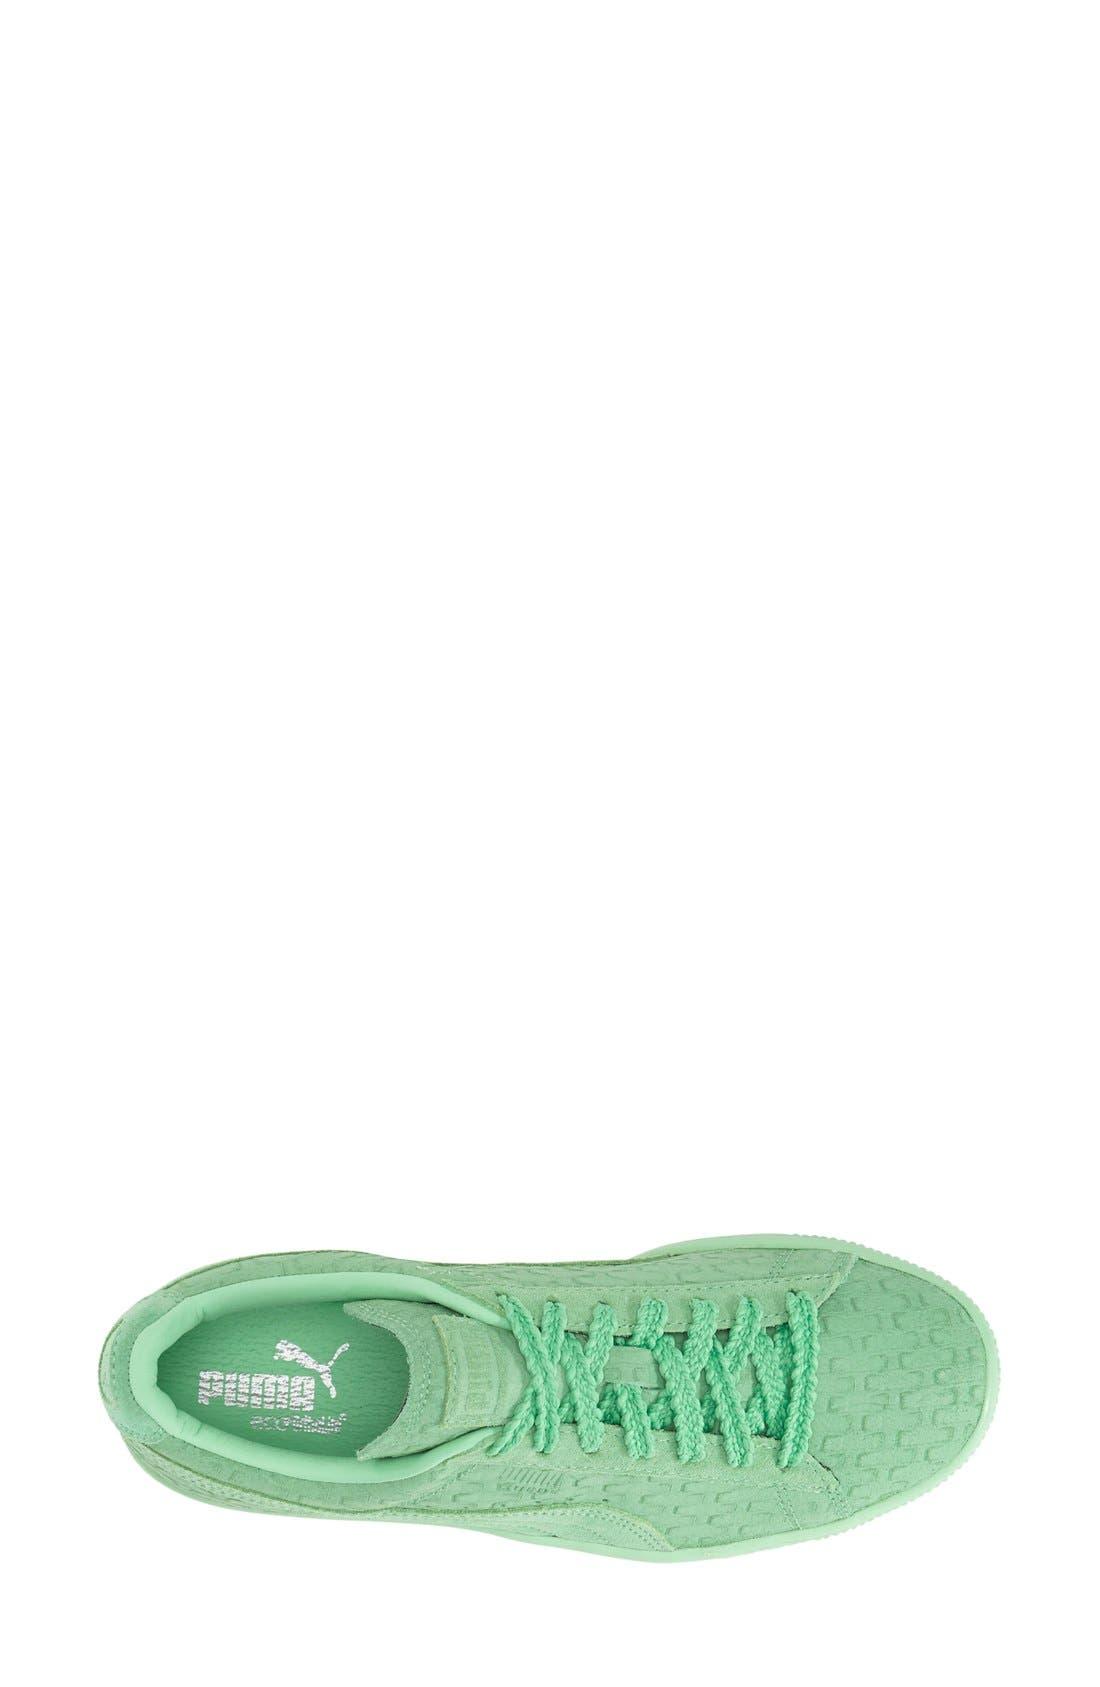 'Suede Classic - Solange' Sneaker,                             Alternate thumbnail 2, color,                             300